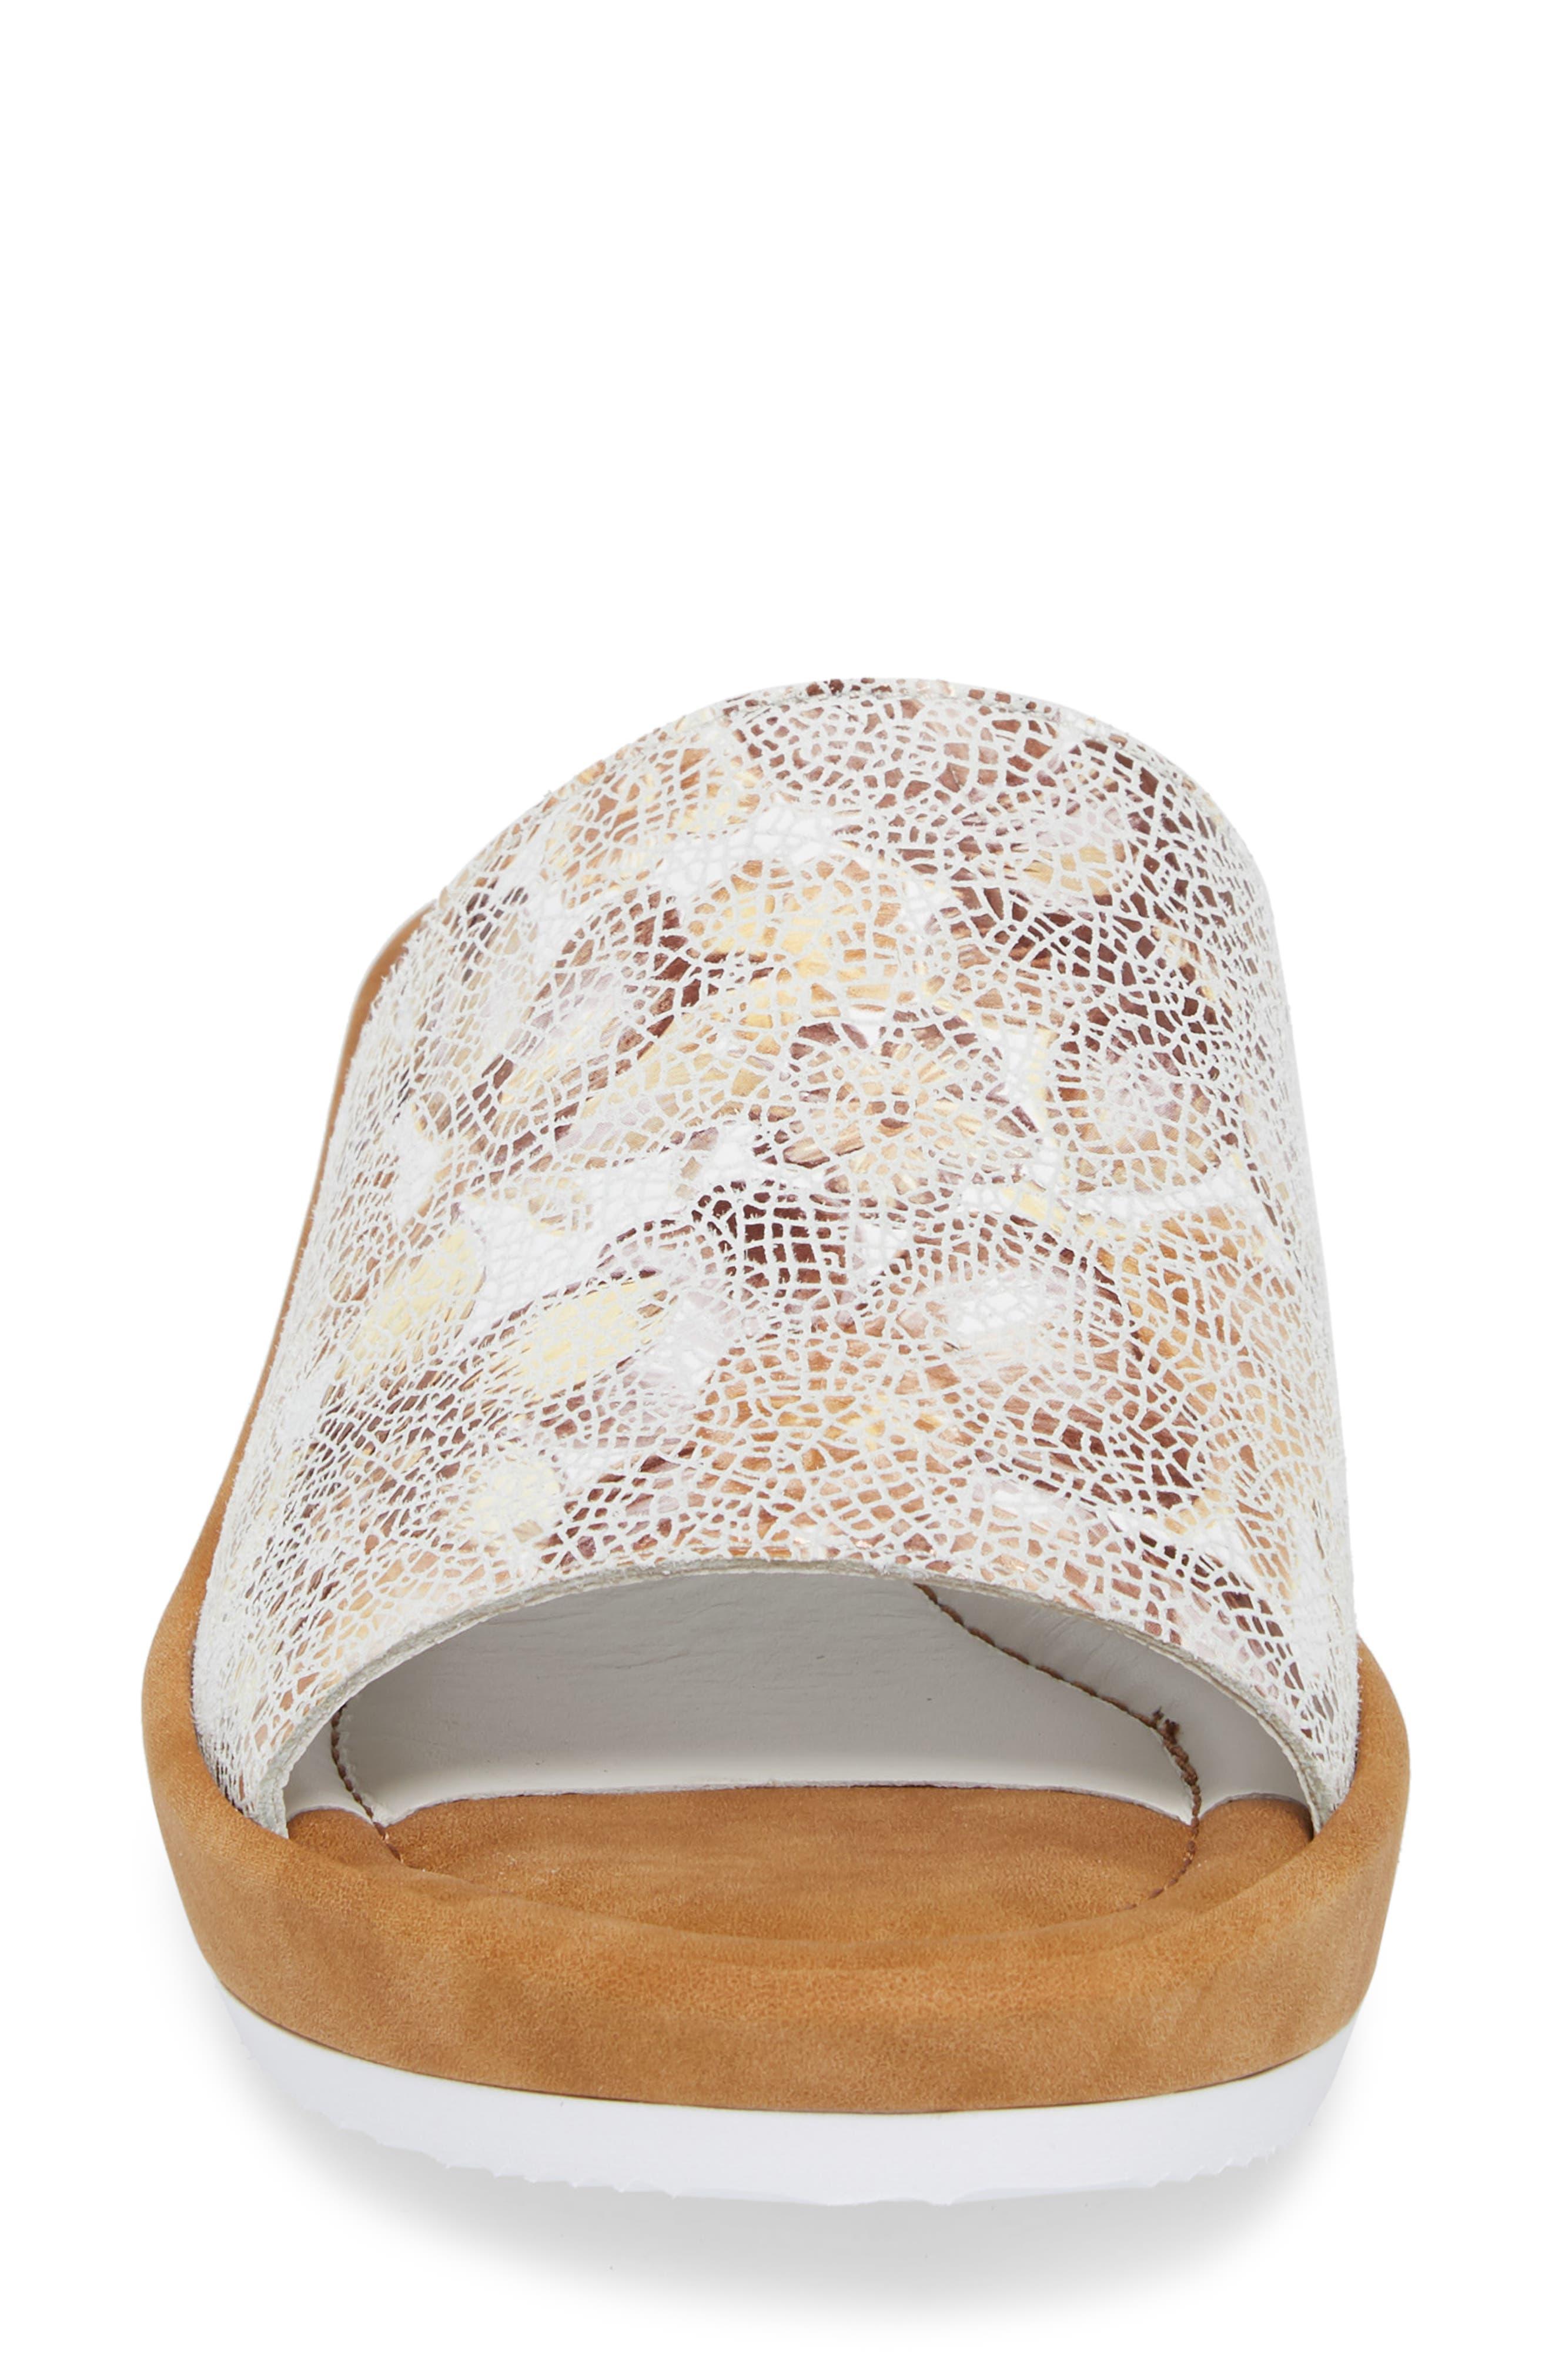 Tania Platform Wedge Slide Sandal,                             Alternate thumbnail 4, color,                             Taupe Leather